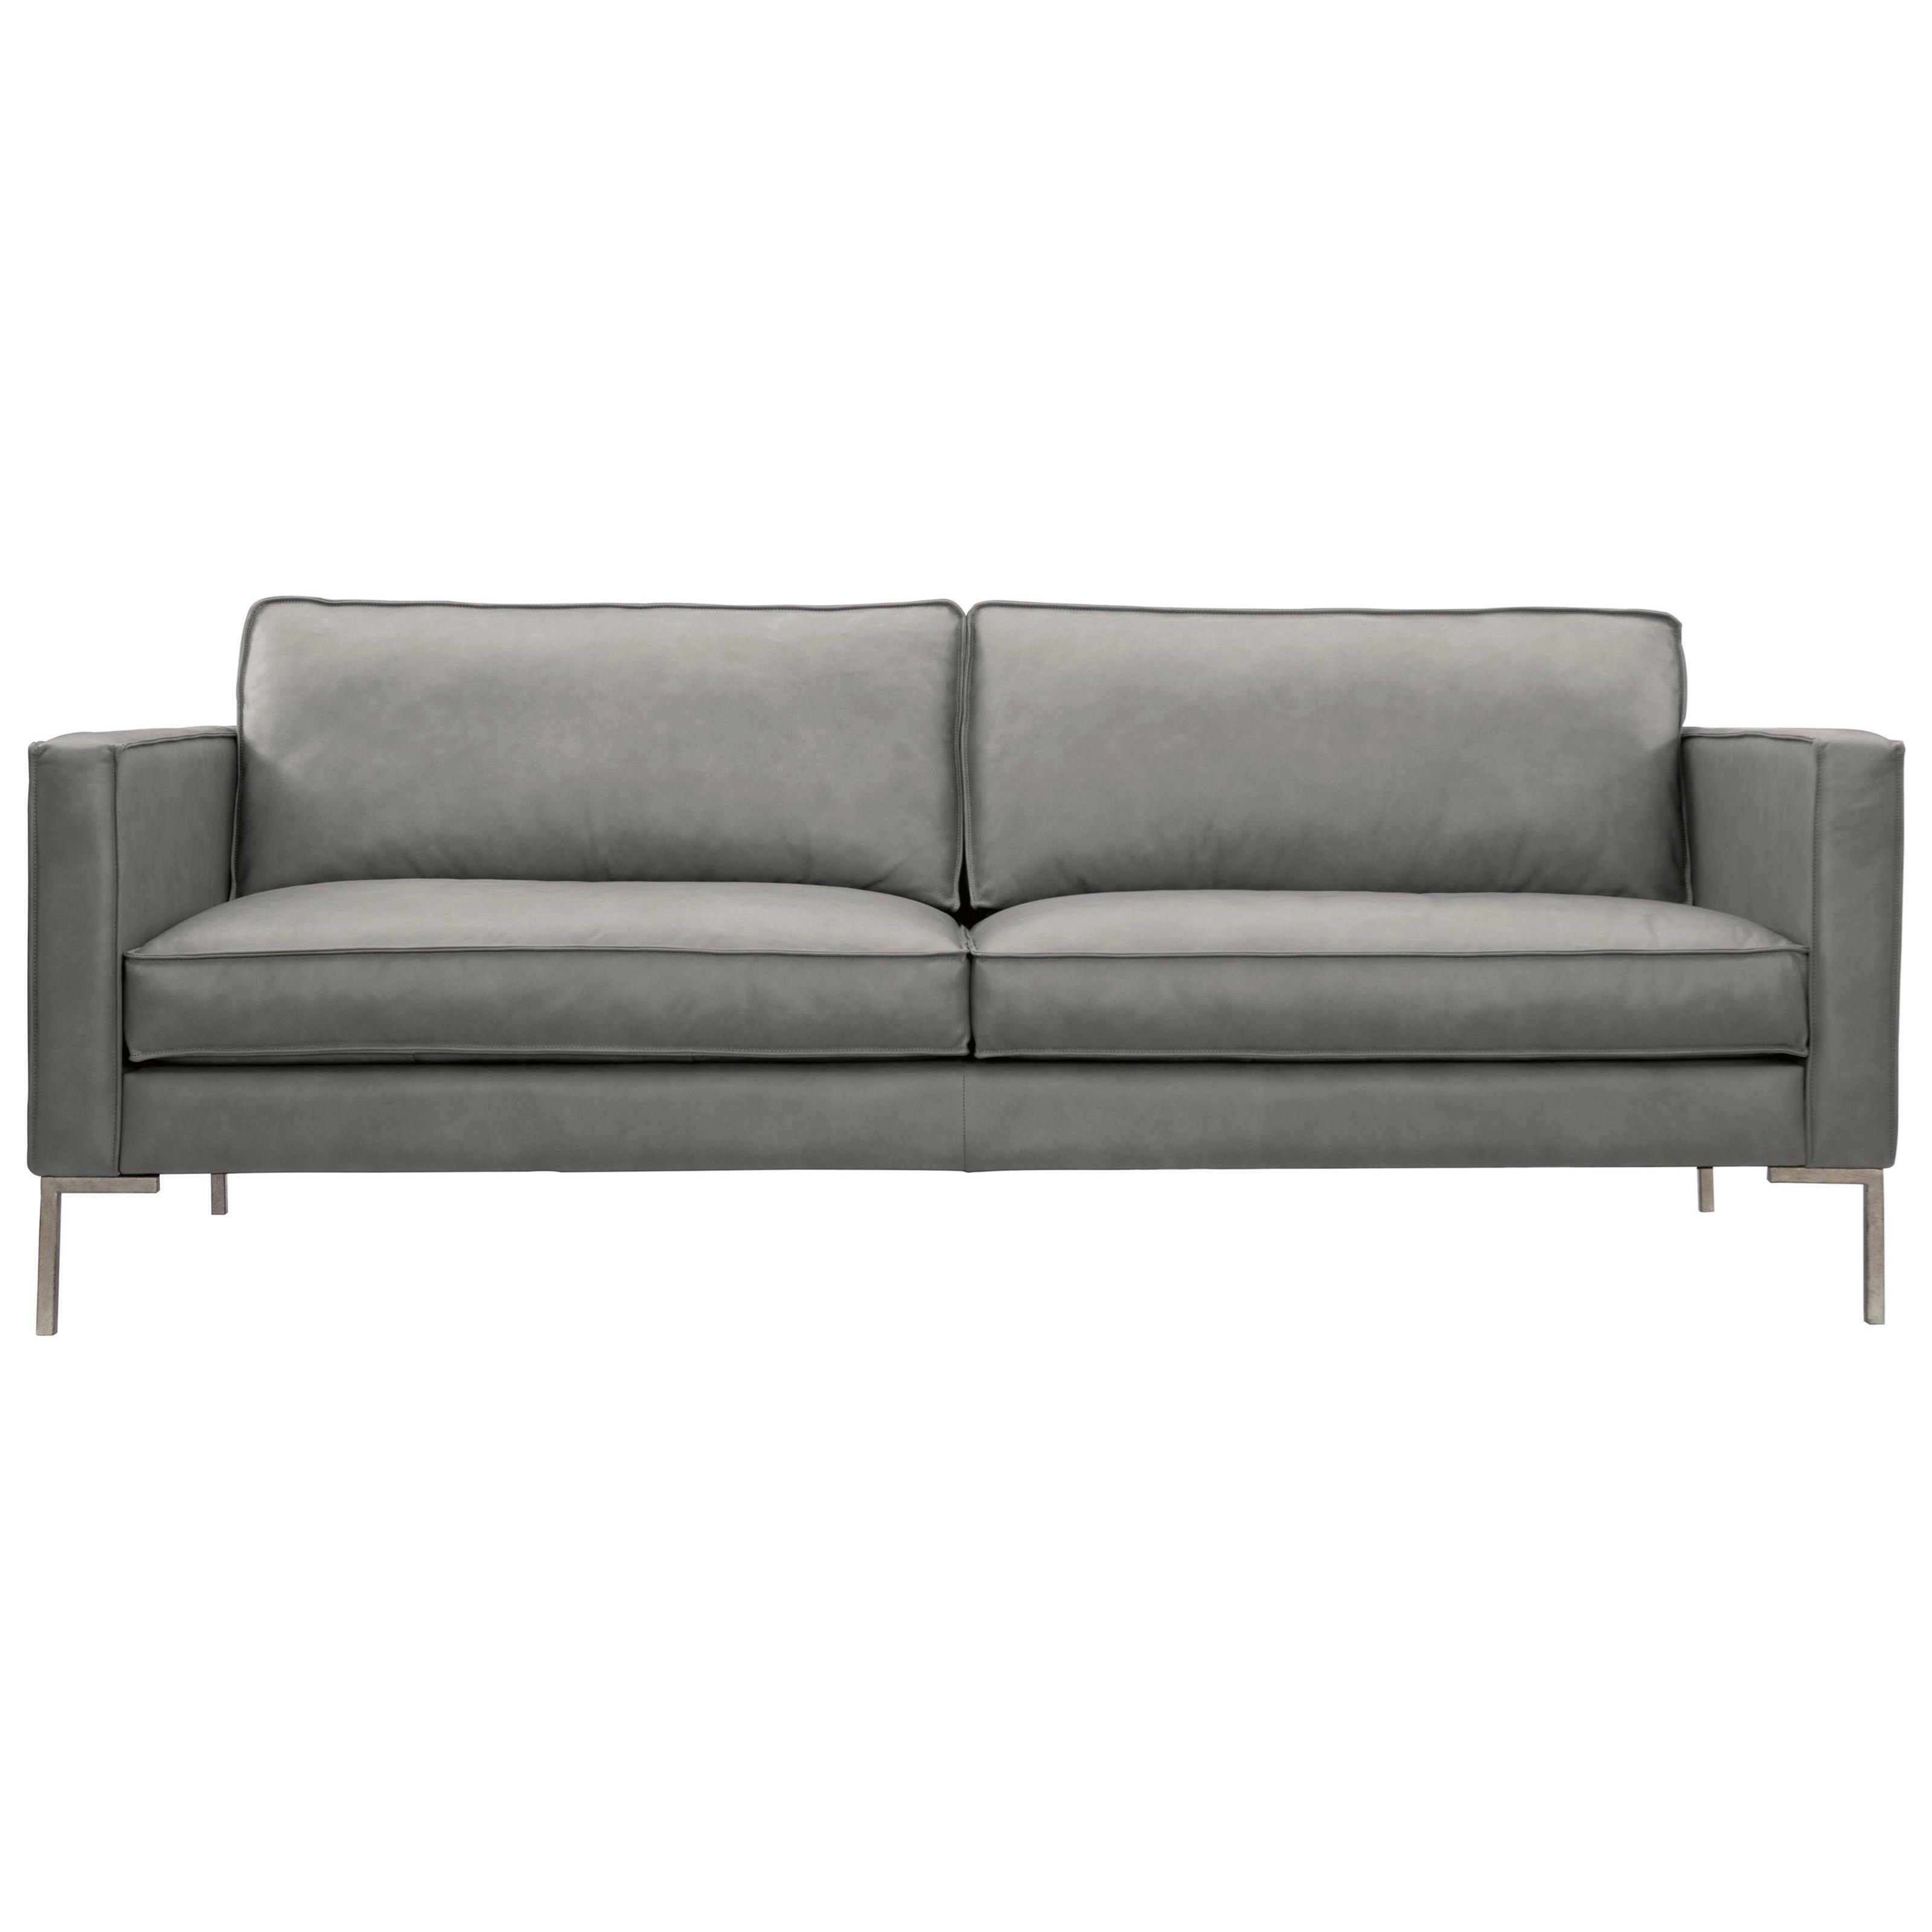 Loft - Logan Square Concord Sofa by Bernhardt at Baer's Furniture